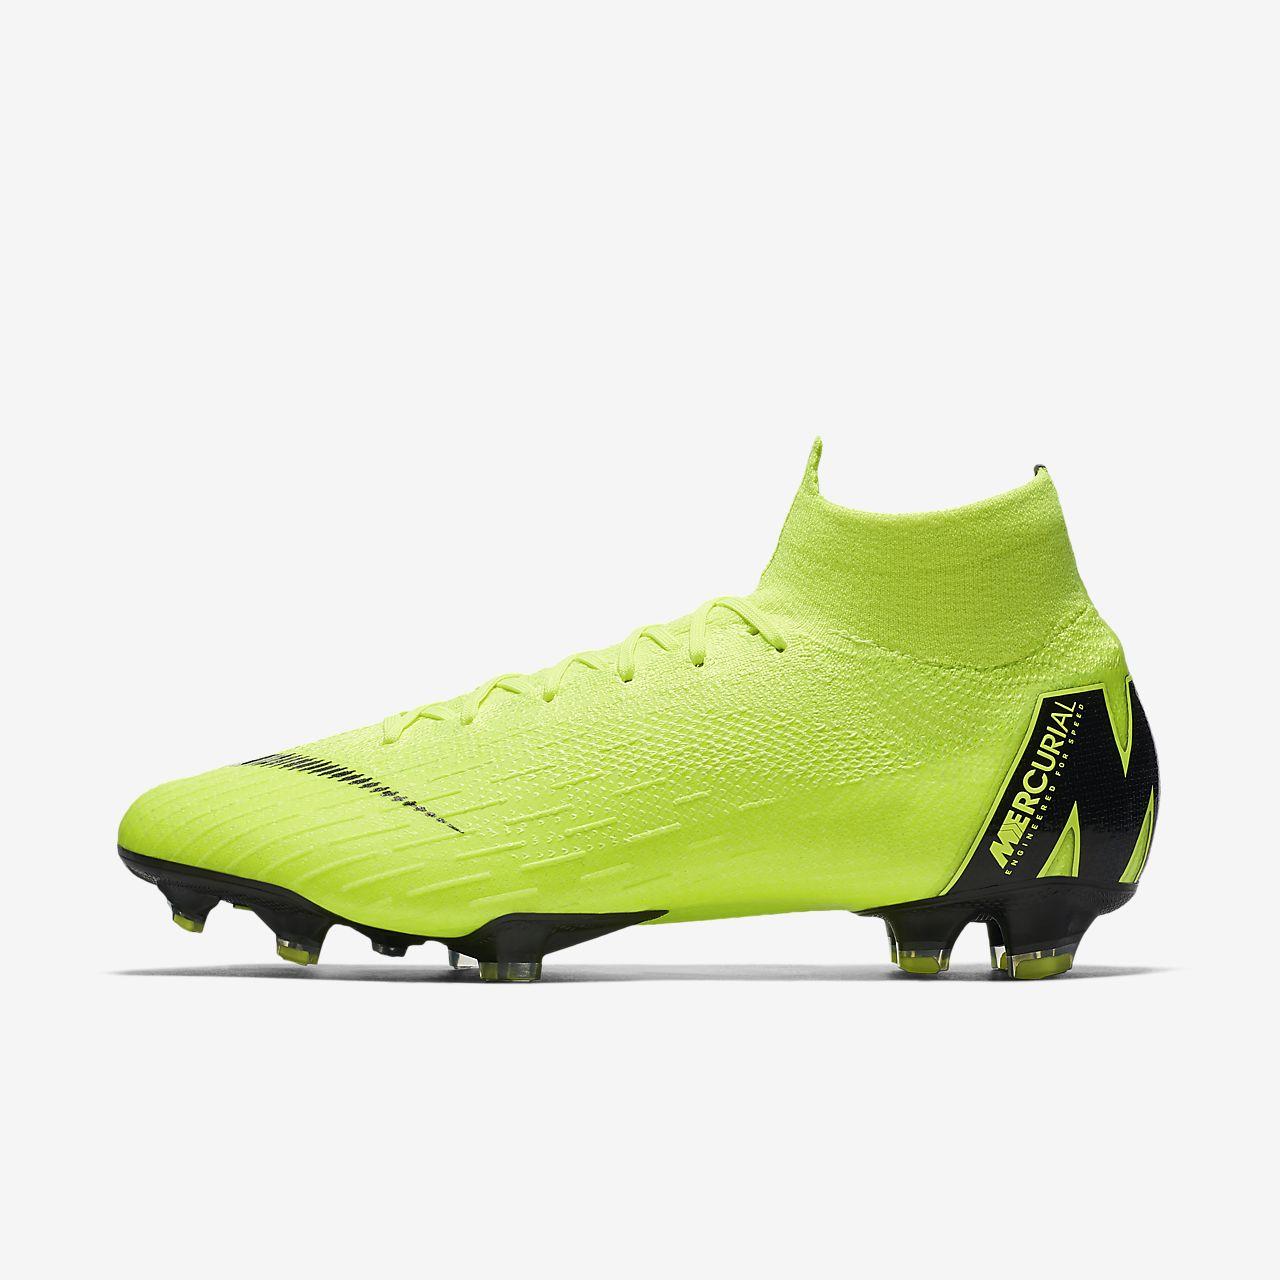 b043d24745d3f7 Nike Mercurial Superfly 360 Elite Firm-Ground Football Boot. Nike.com ZA